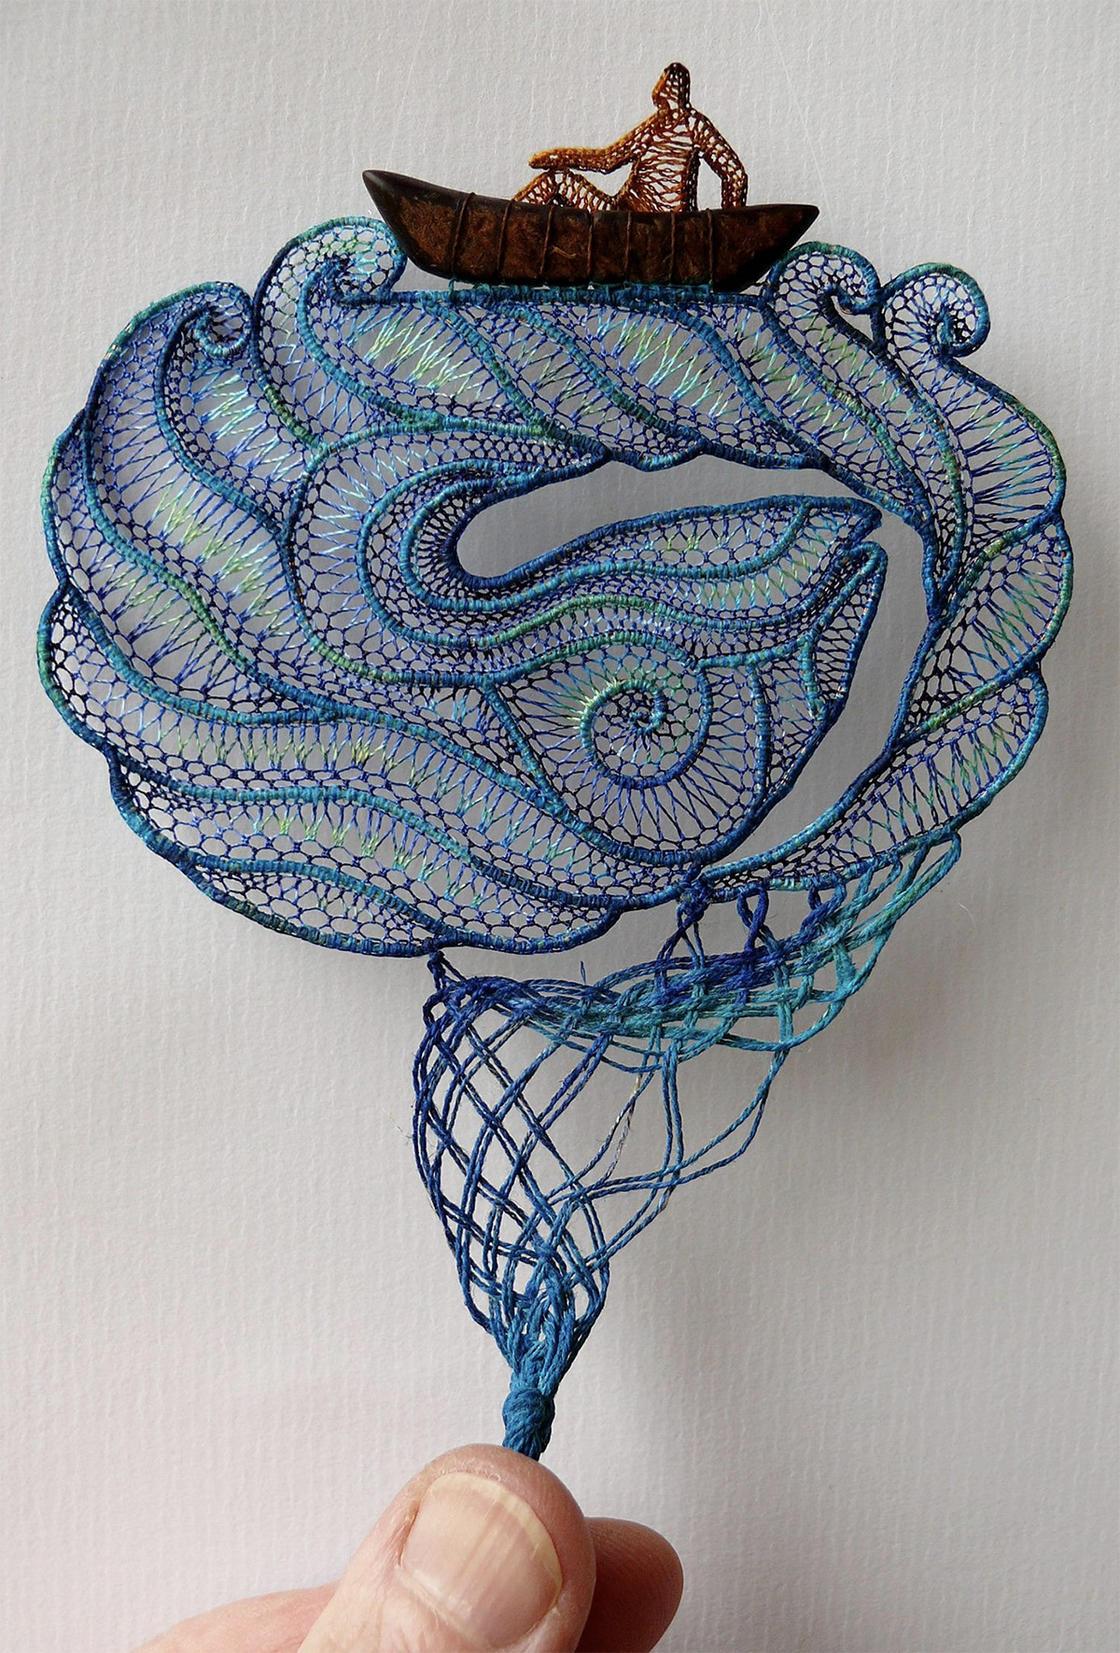 Delicate lace faces by Agnes Herczeg